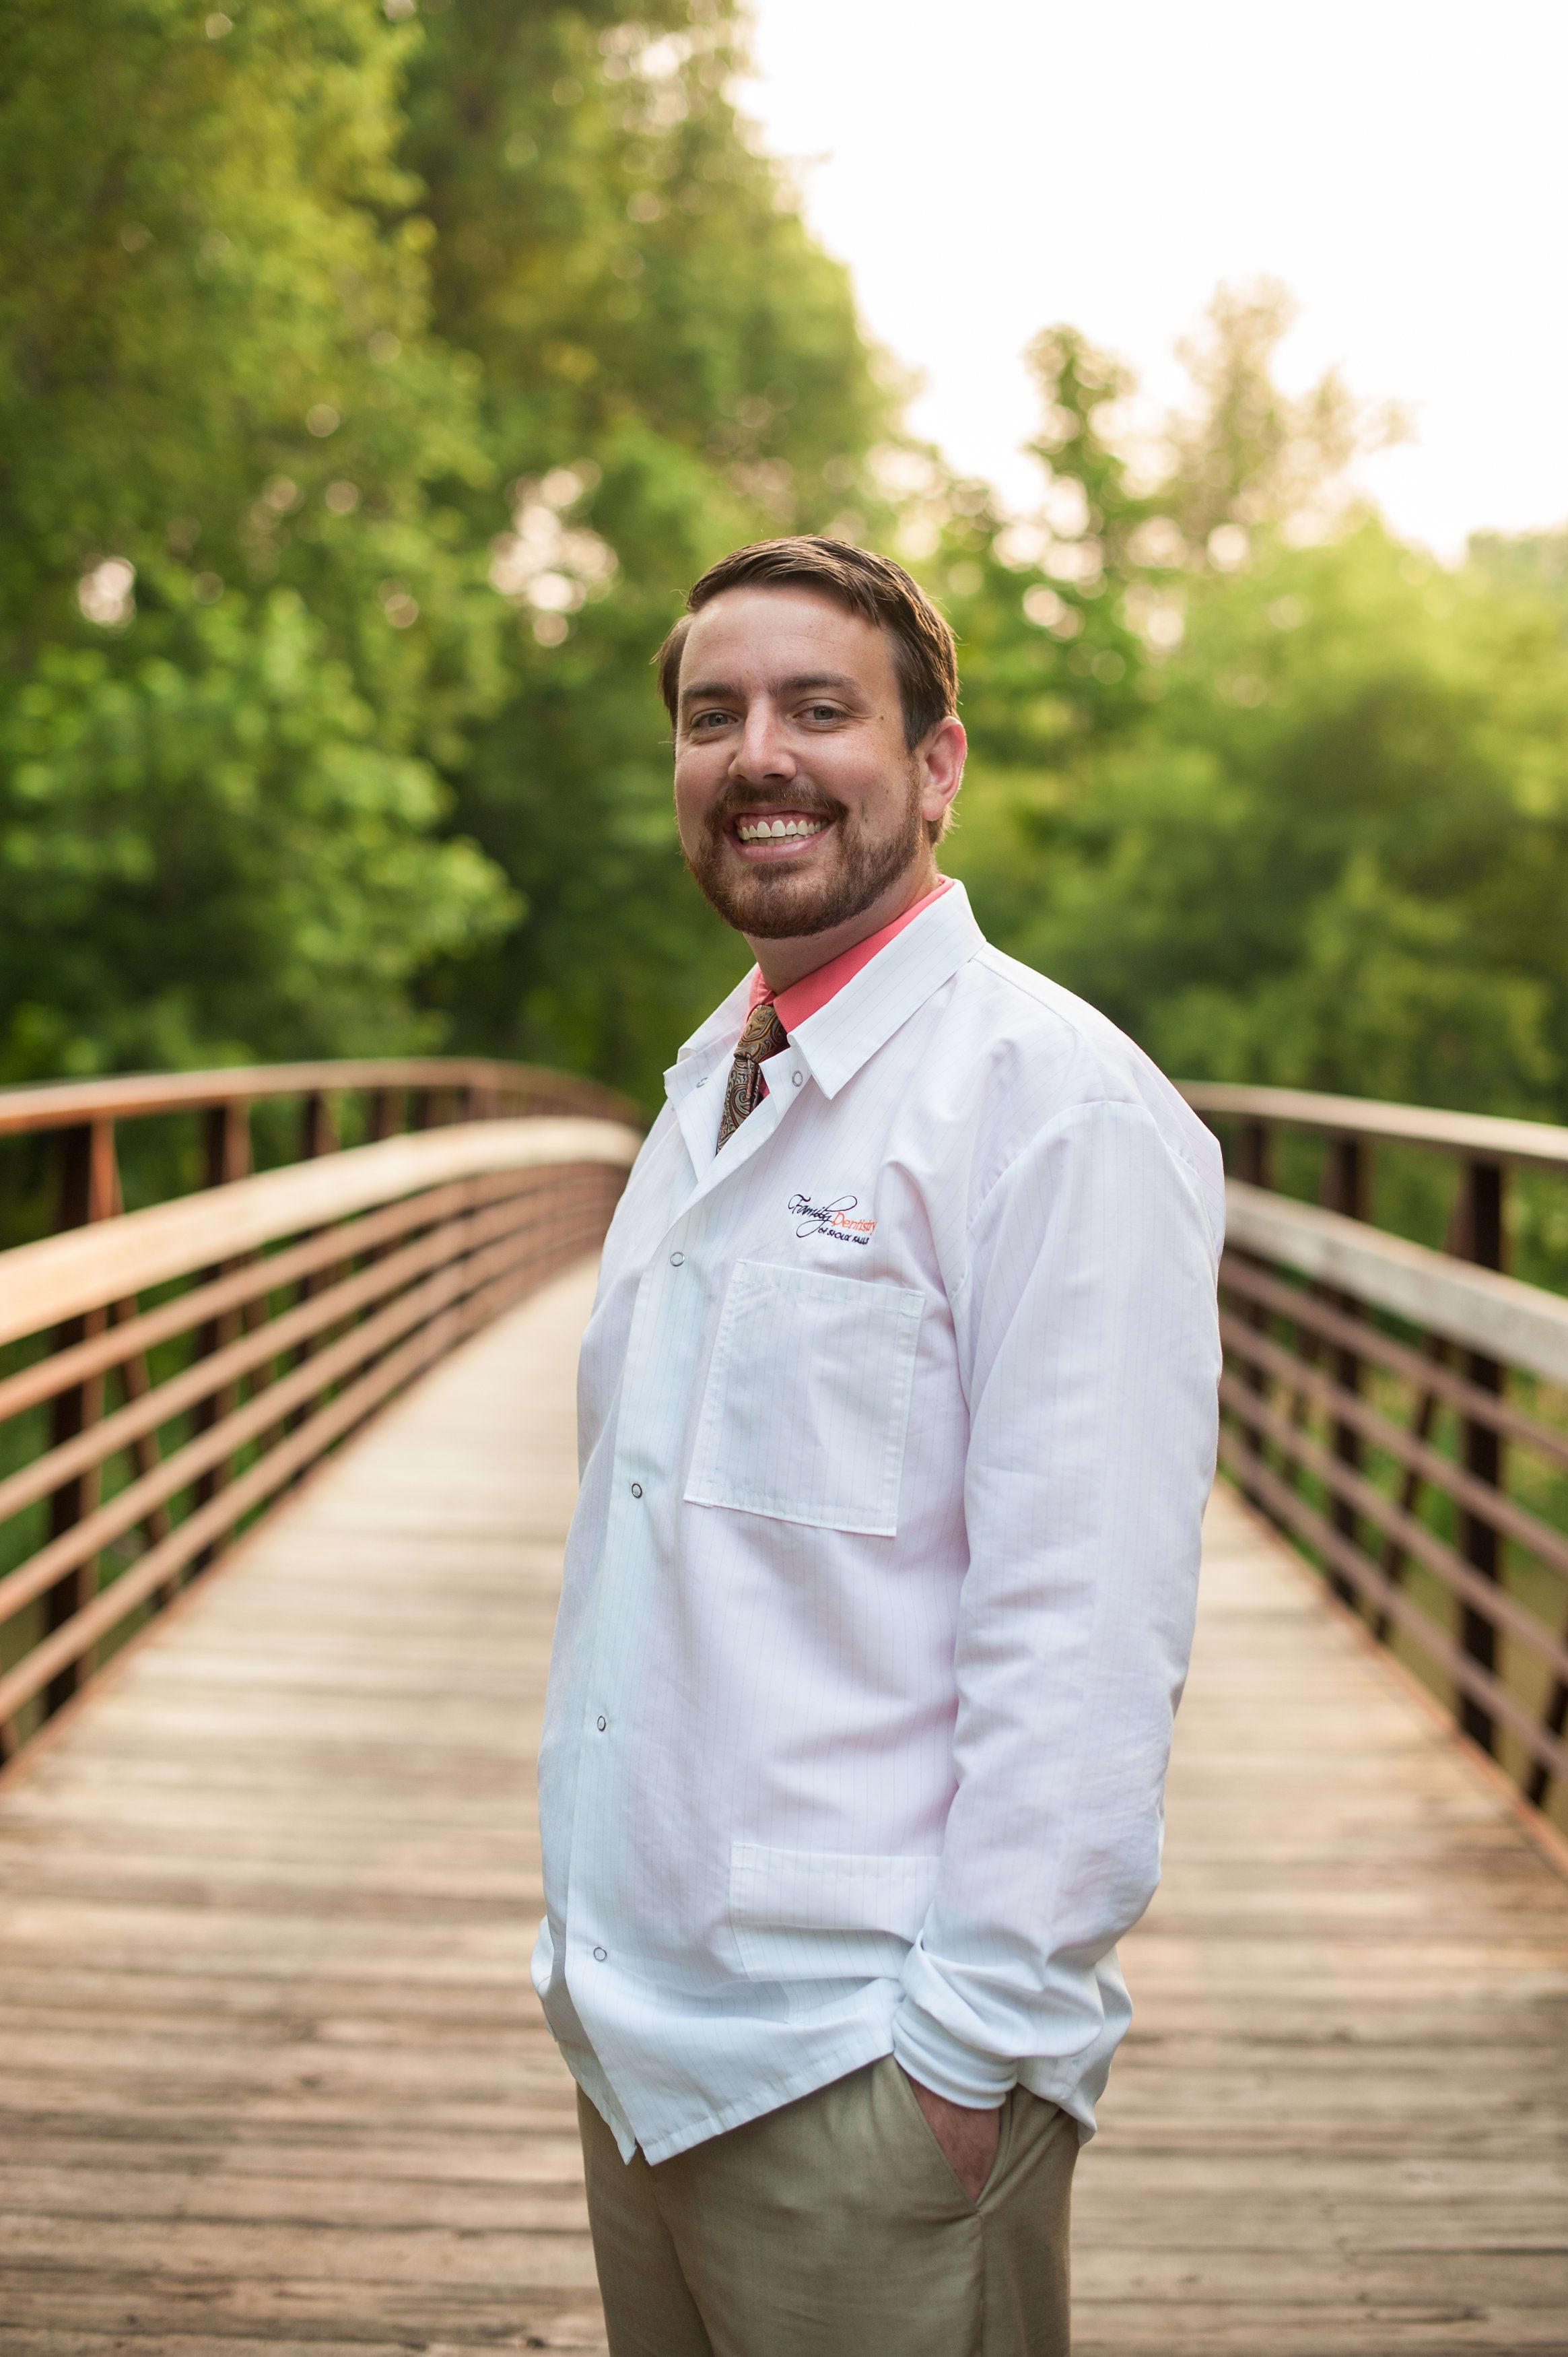 Jonathan D Held, DDS General Dentistry